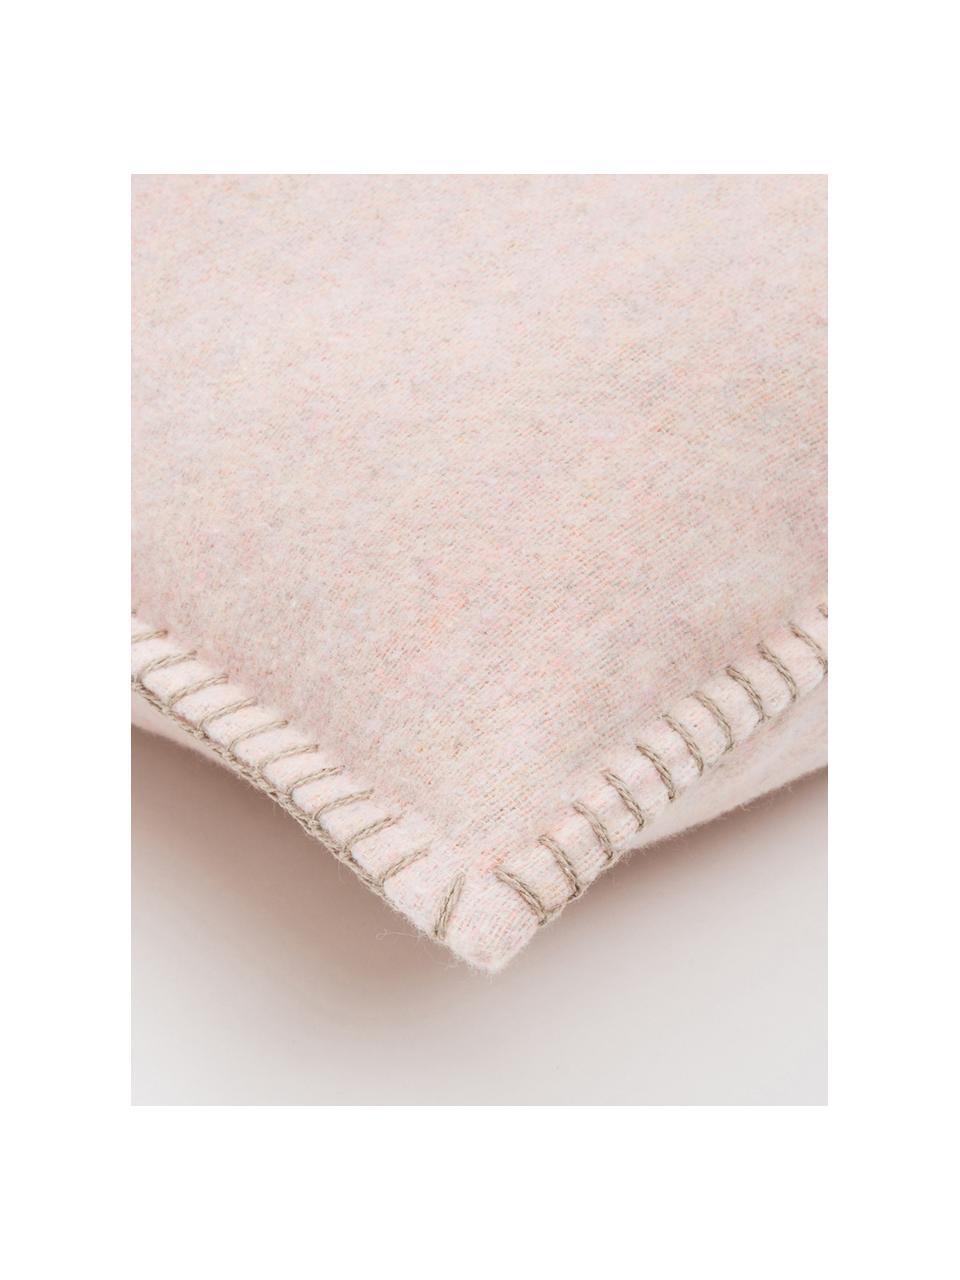 Weiche Fleece-Kissenhülle Sylt mit Steppnaht, 85% Baumwolle, 8% Viskose, 7% Polyacryl, Altrosa, Creme, 40 x 40 cm